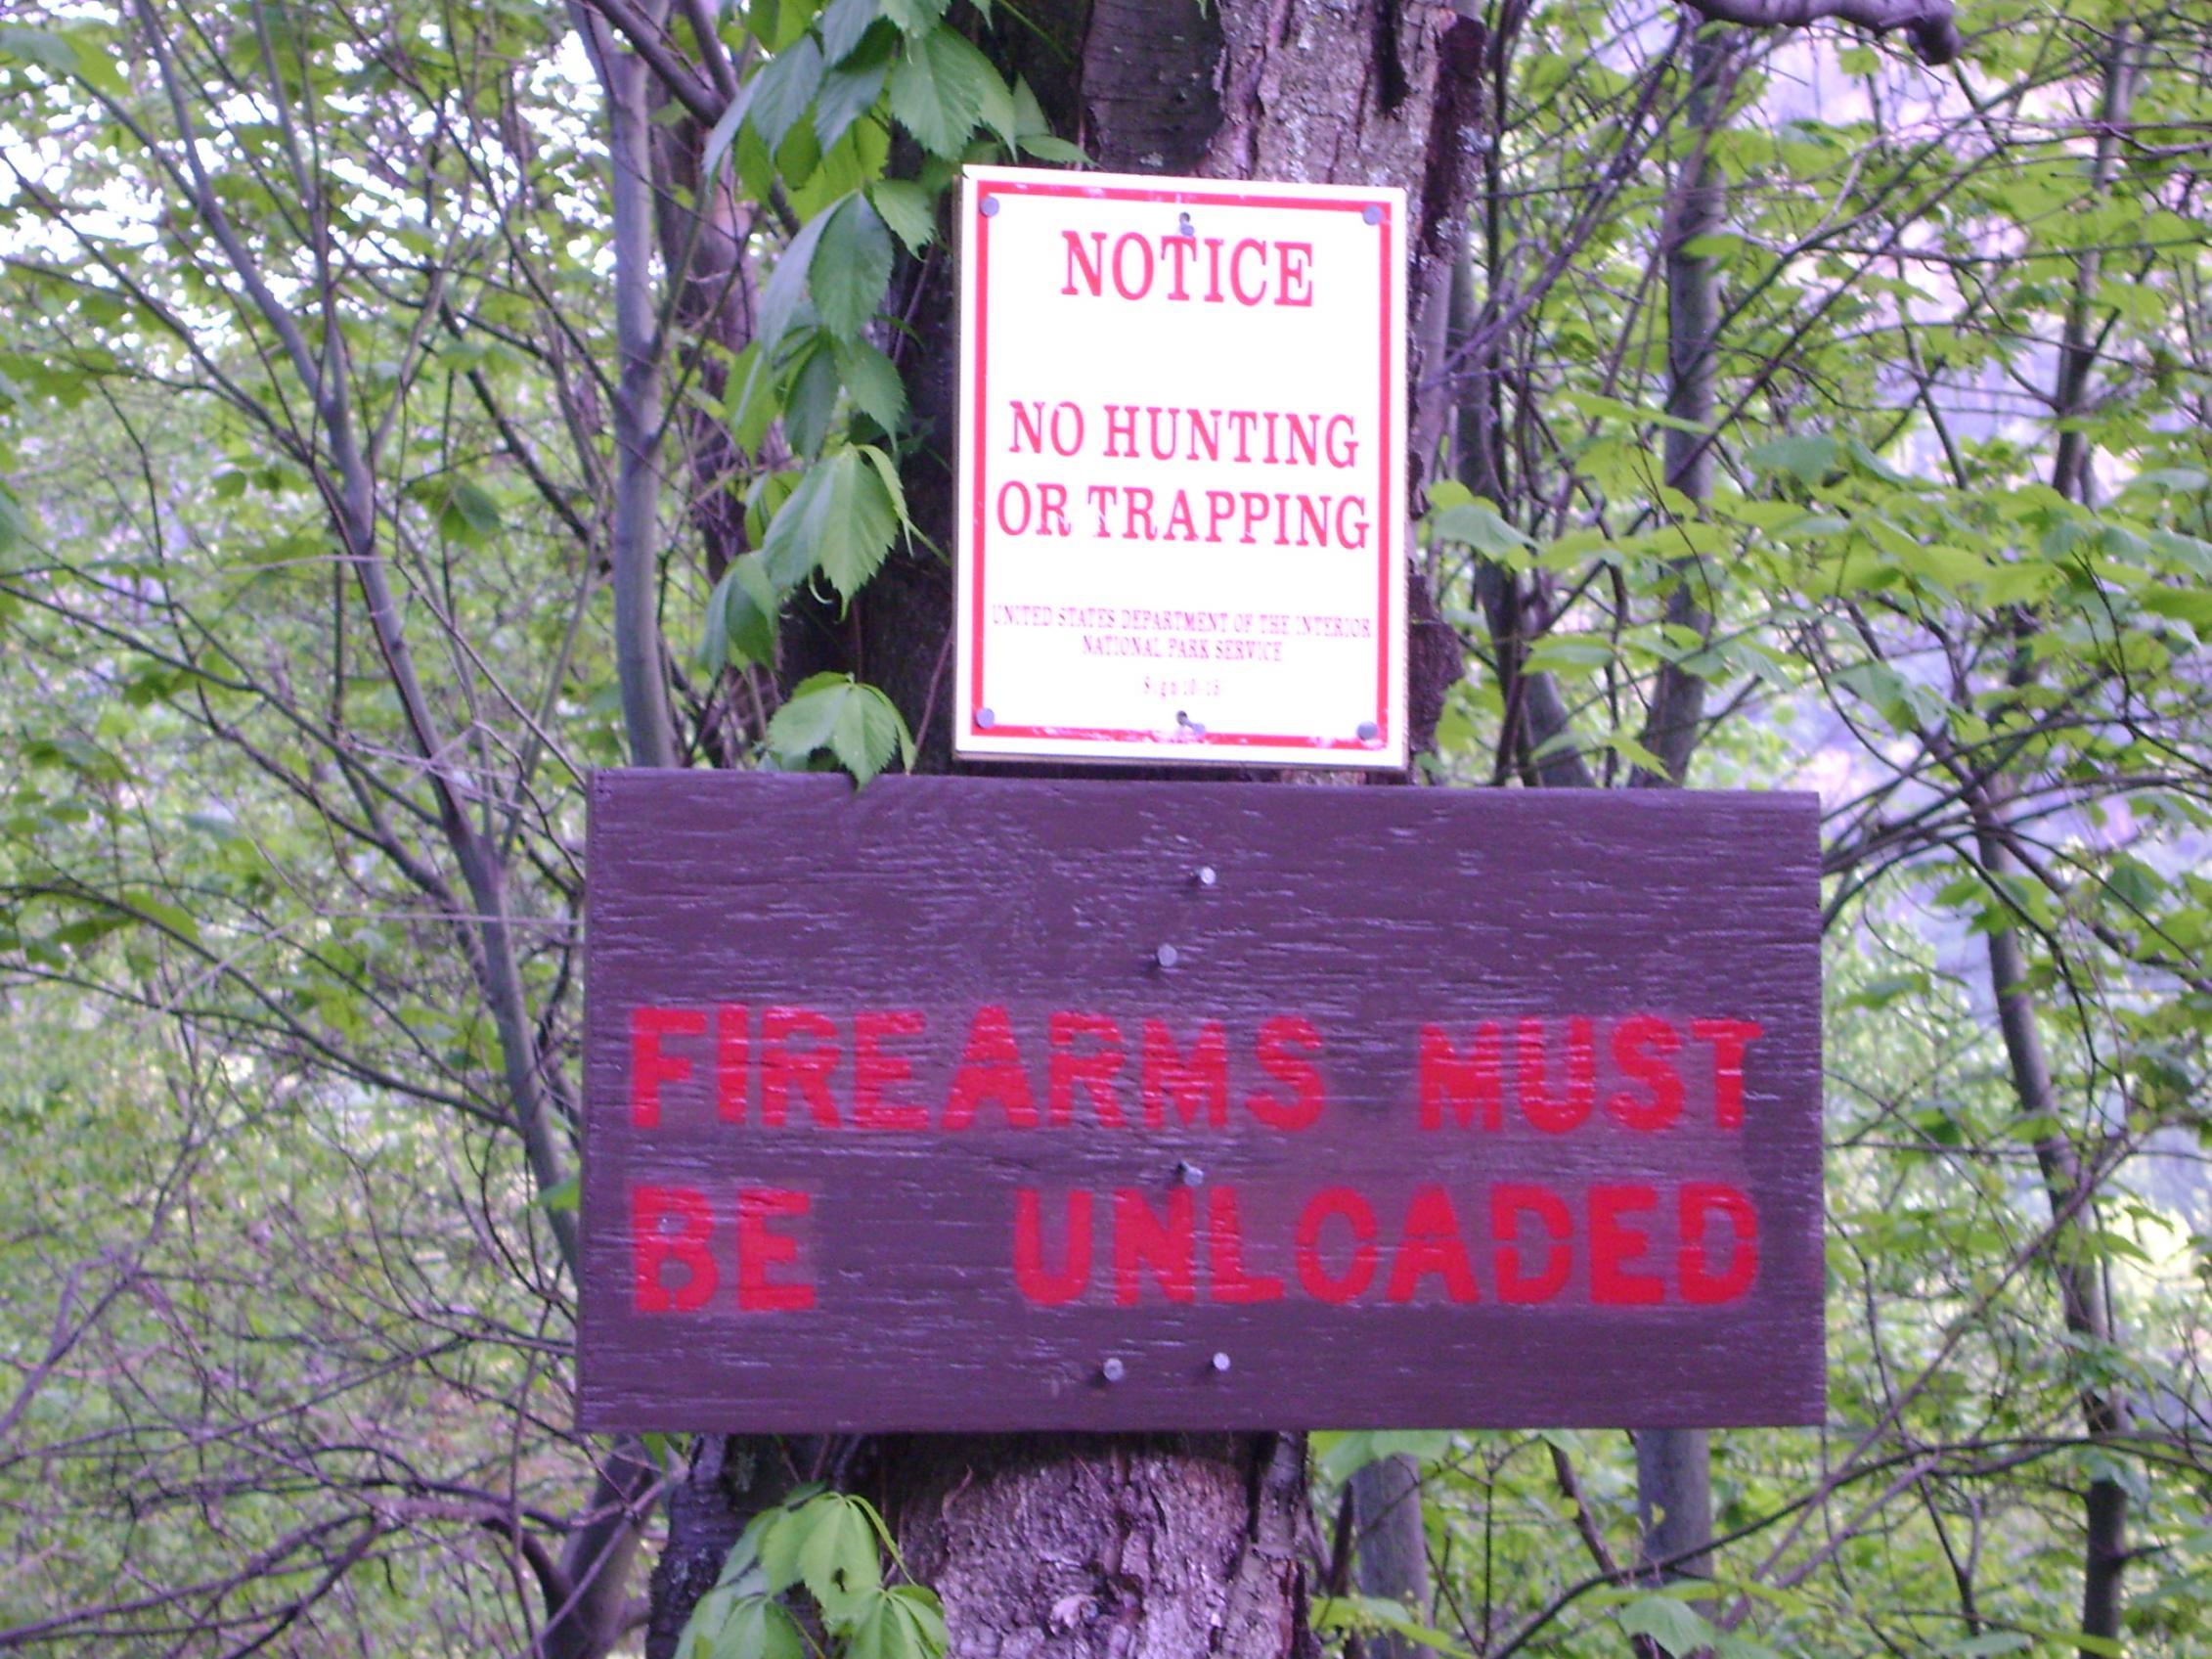 Shenandoah National Park sign that says firearms must be unloaded-dsc03579.jpg